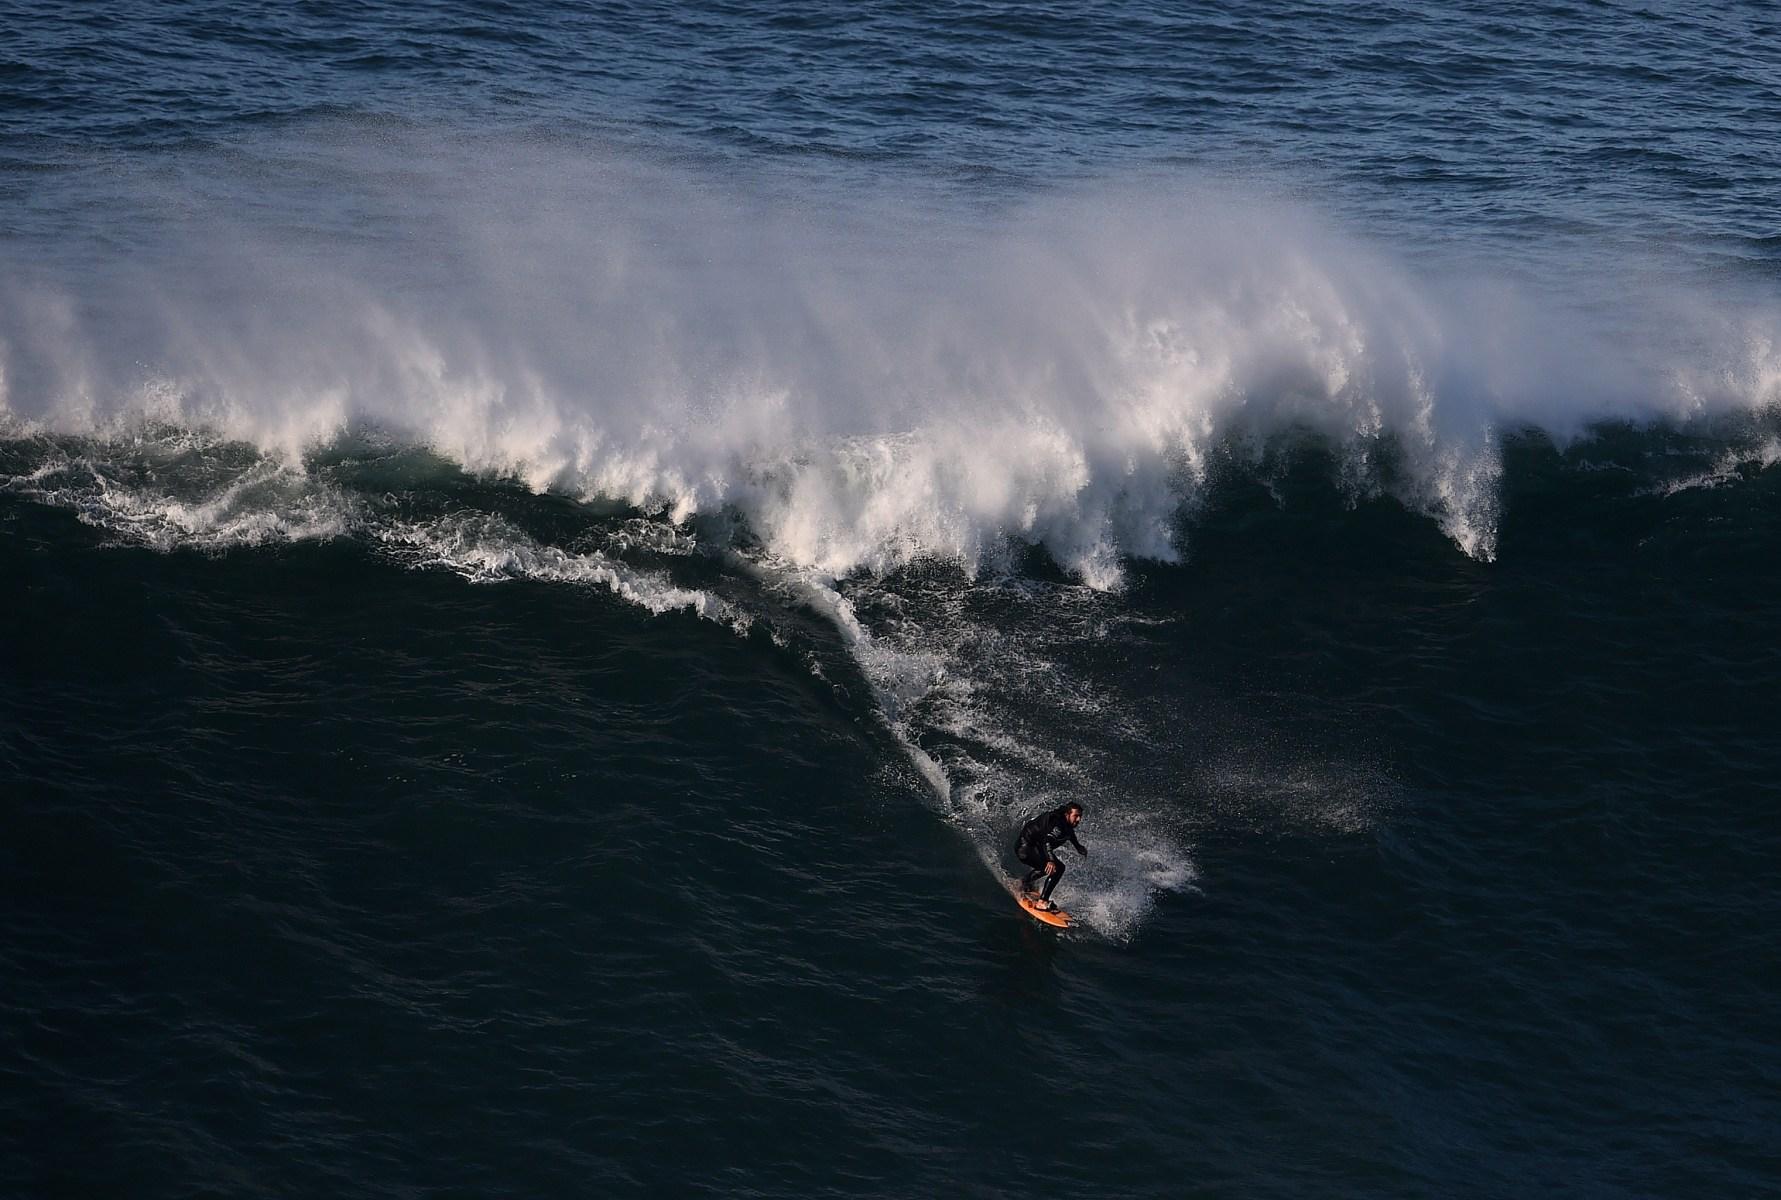 Brazilian big wave surfer Rodrigo Koxa drops a wave at Nazare's North Beach on November 29, 2014.   AFP PHOTO/ FRANCISCO LEONG        (Photo credit should read FRANCISCO LEONG/AFP/Getty Images)